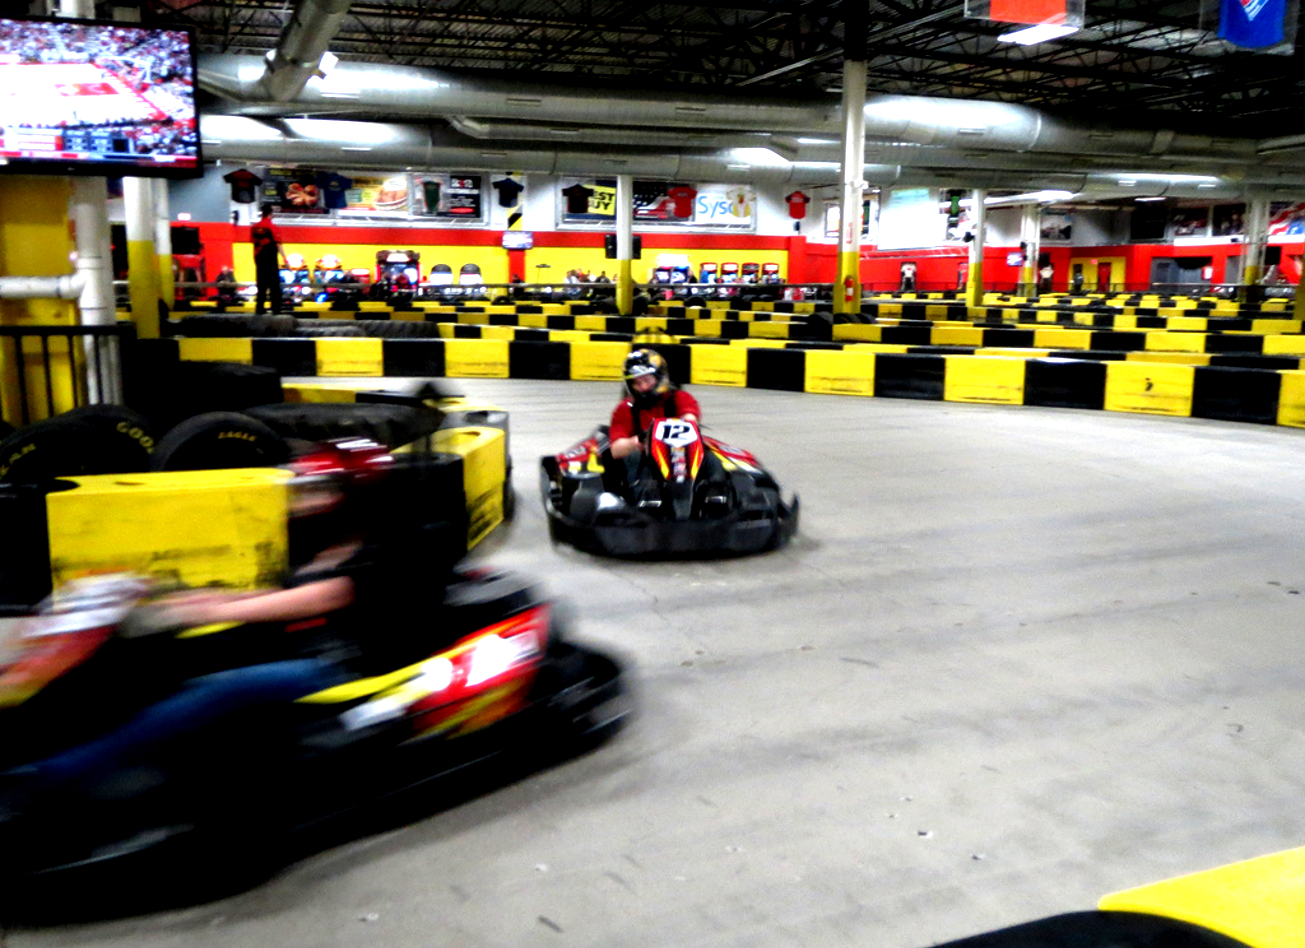 sessions de karting à bruxelles indoor interieur activites vimigo